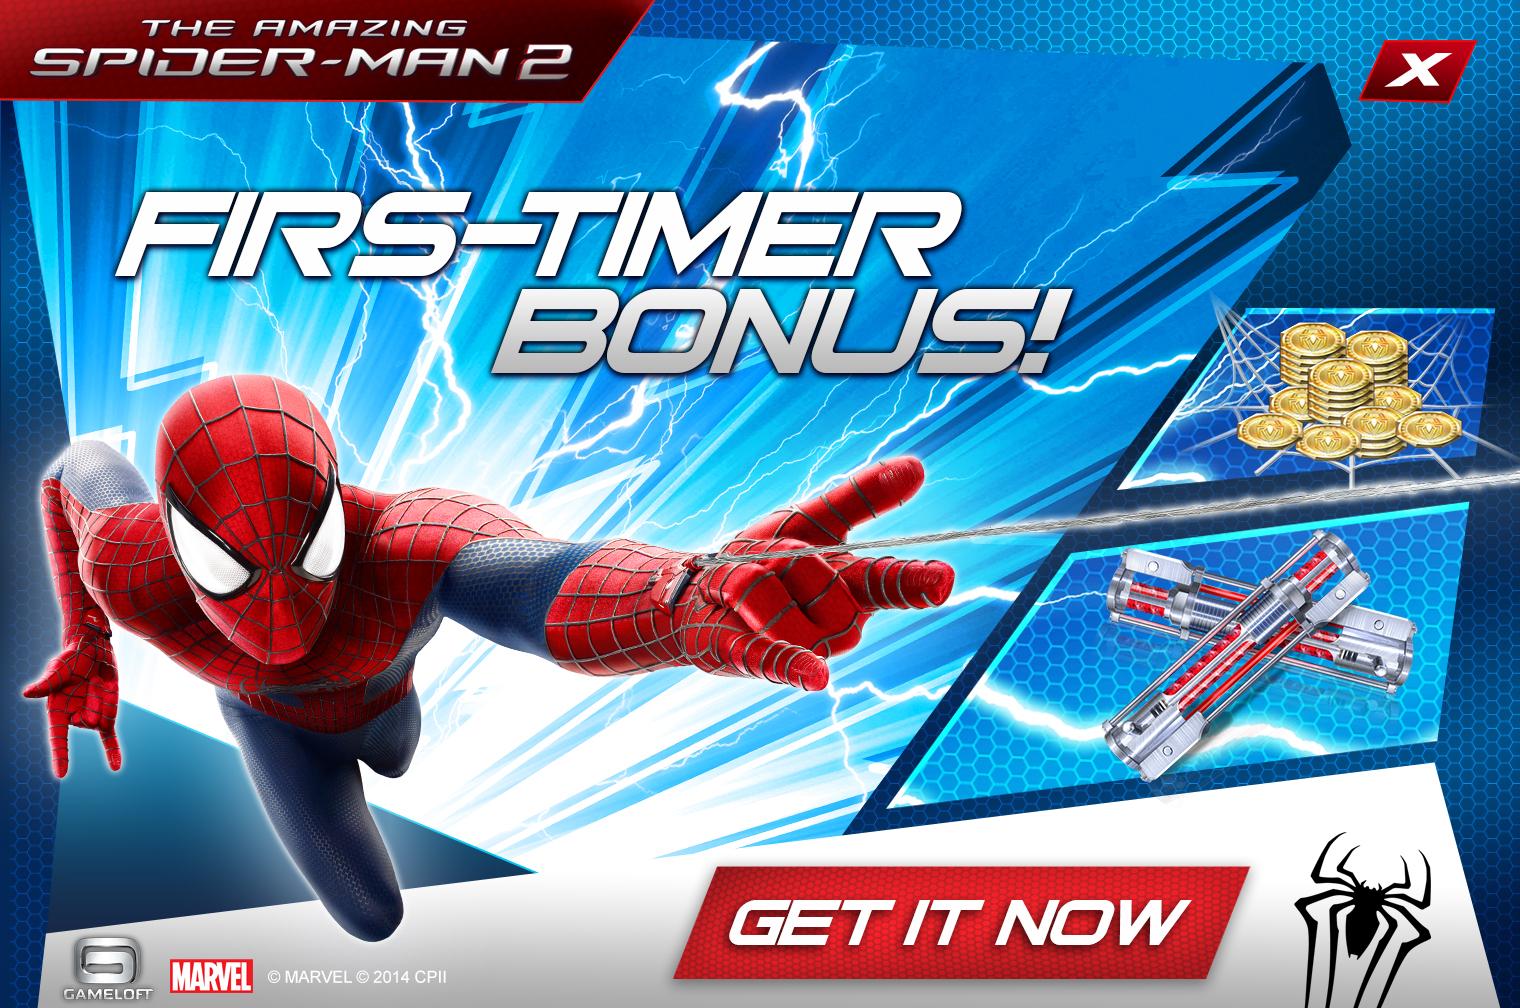 Marvel_AMZ_Spiderman_2_Design_V2